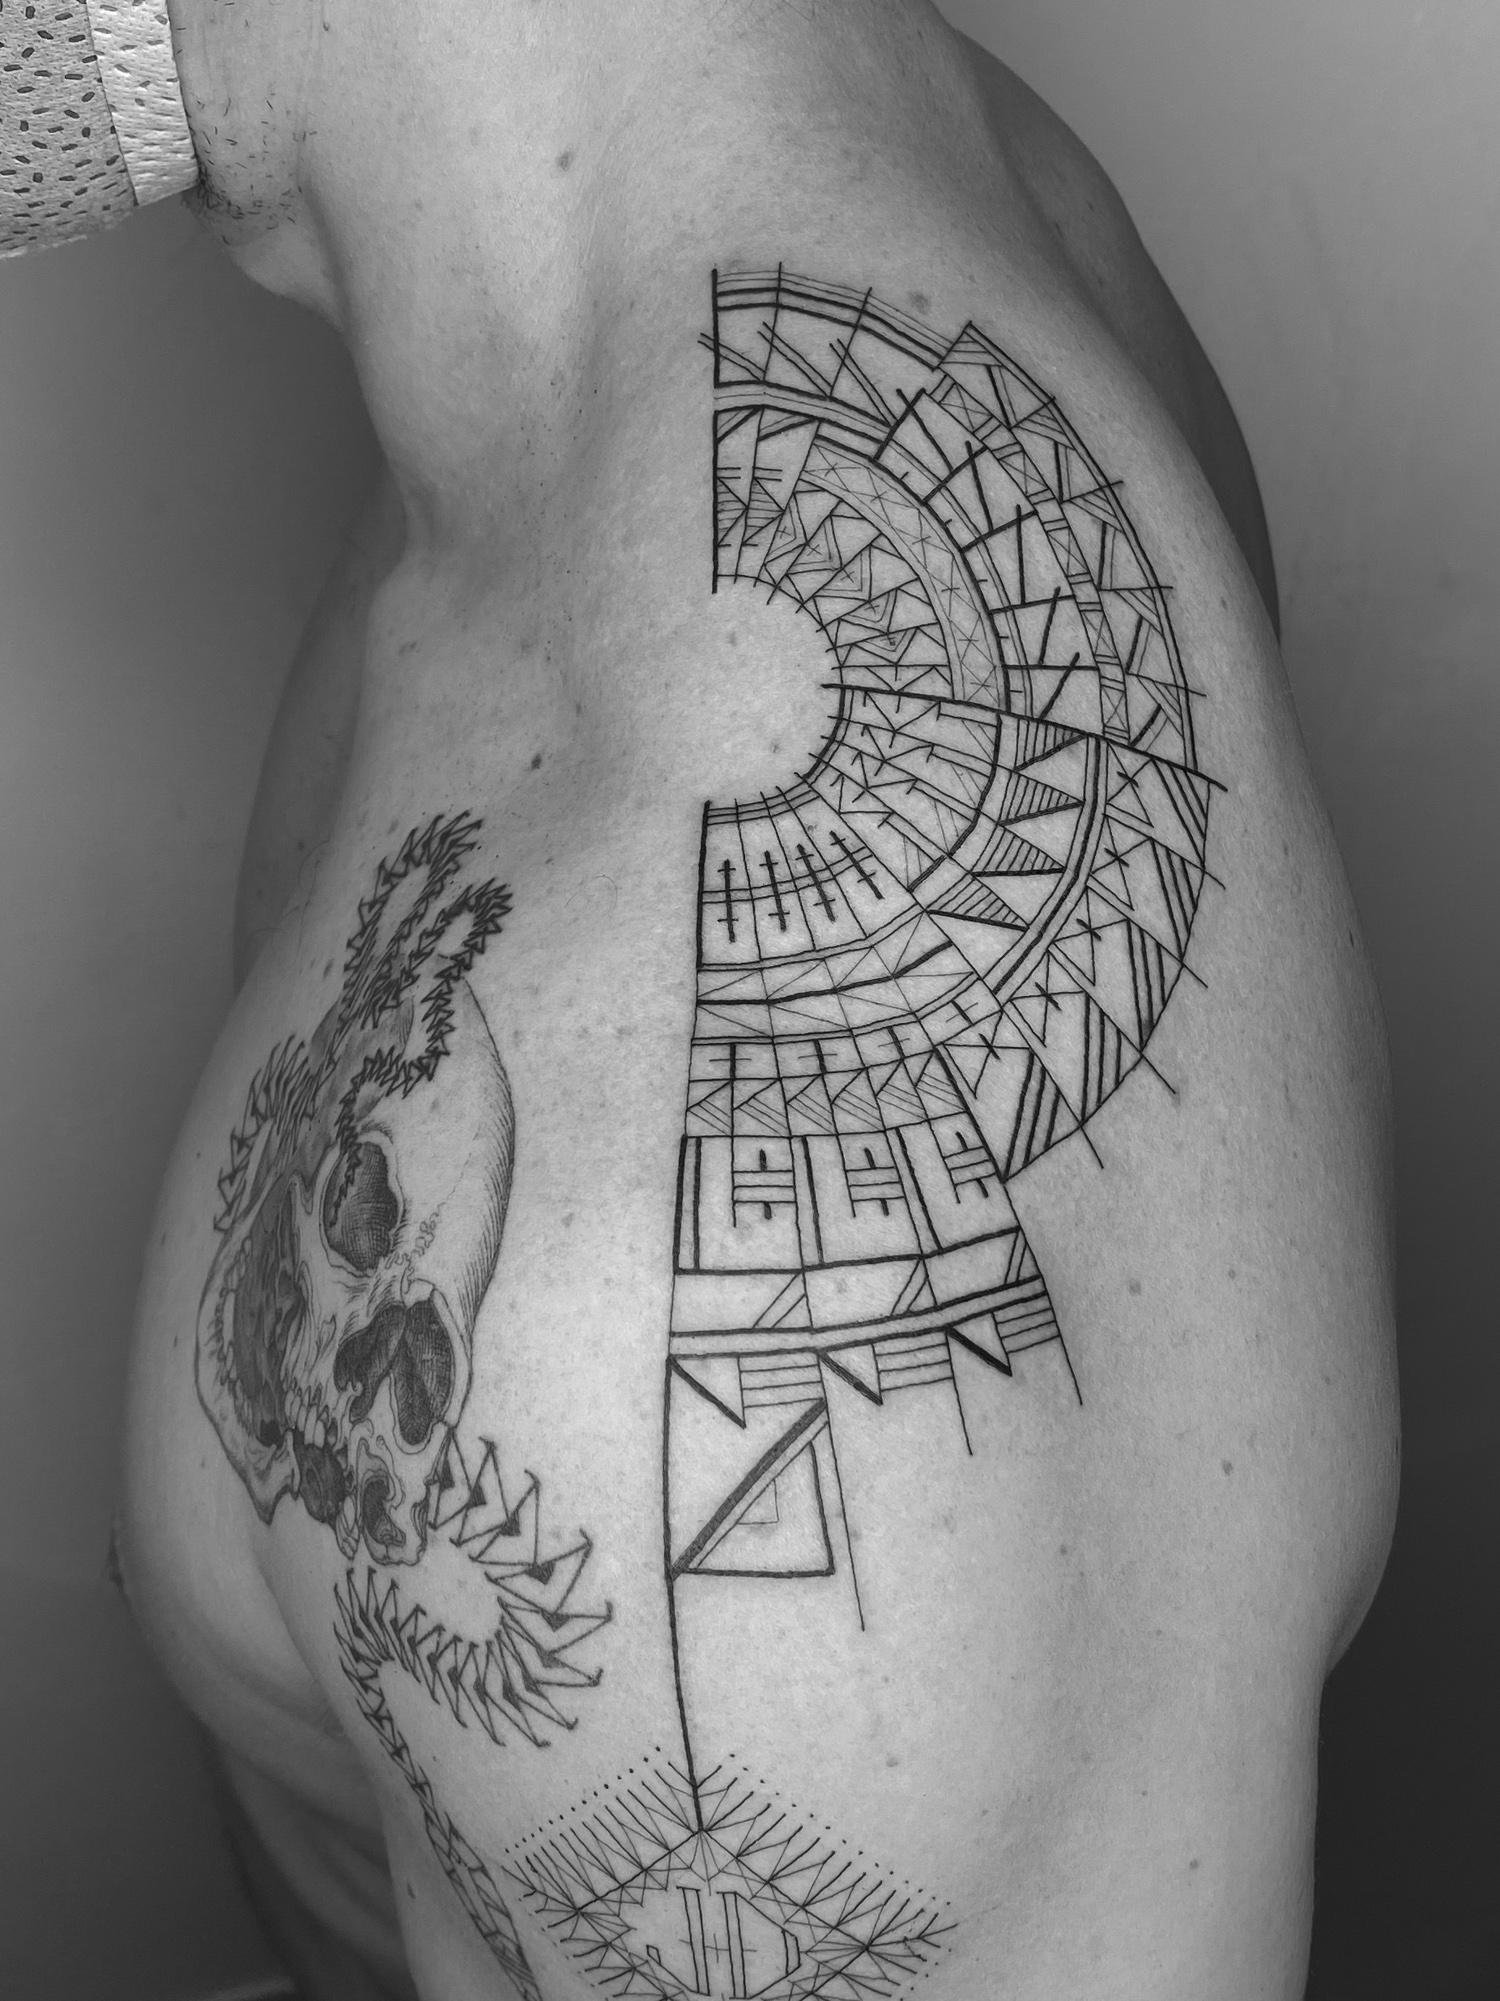 Tattoo by Scott Campbell